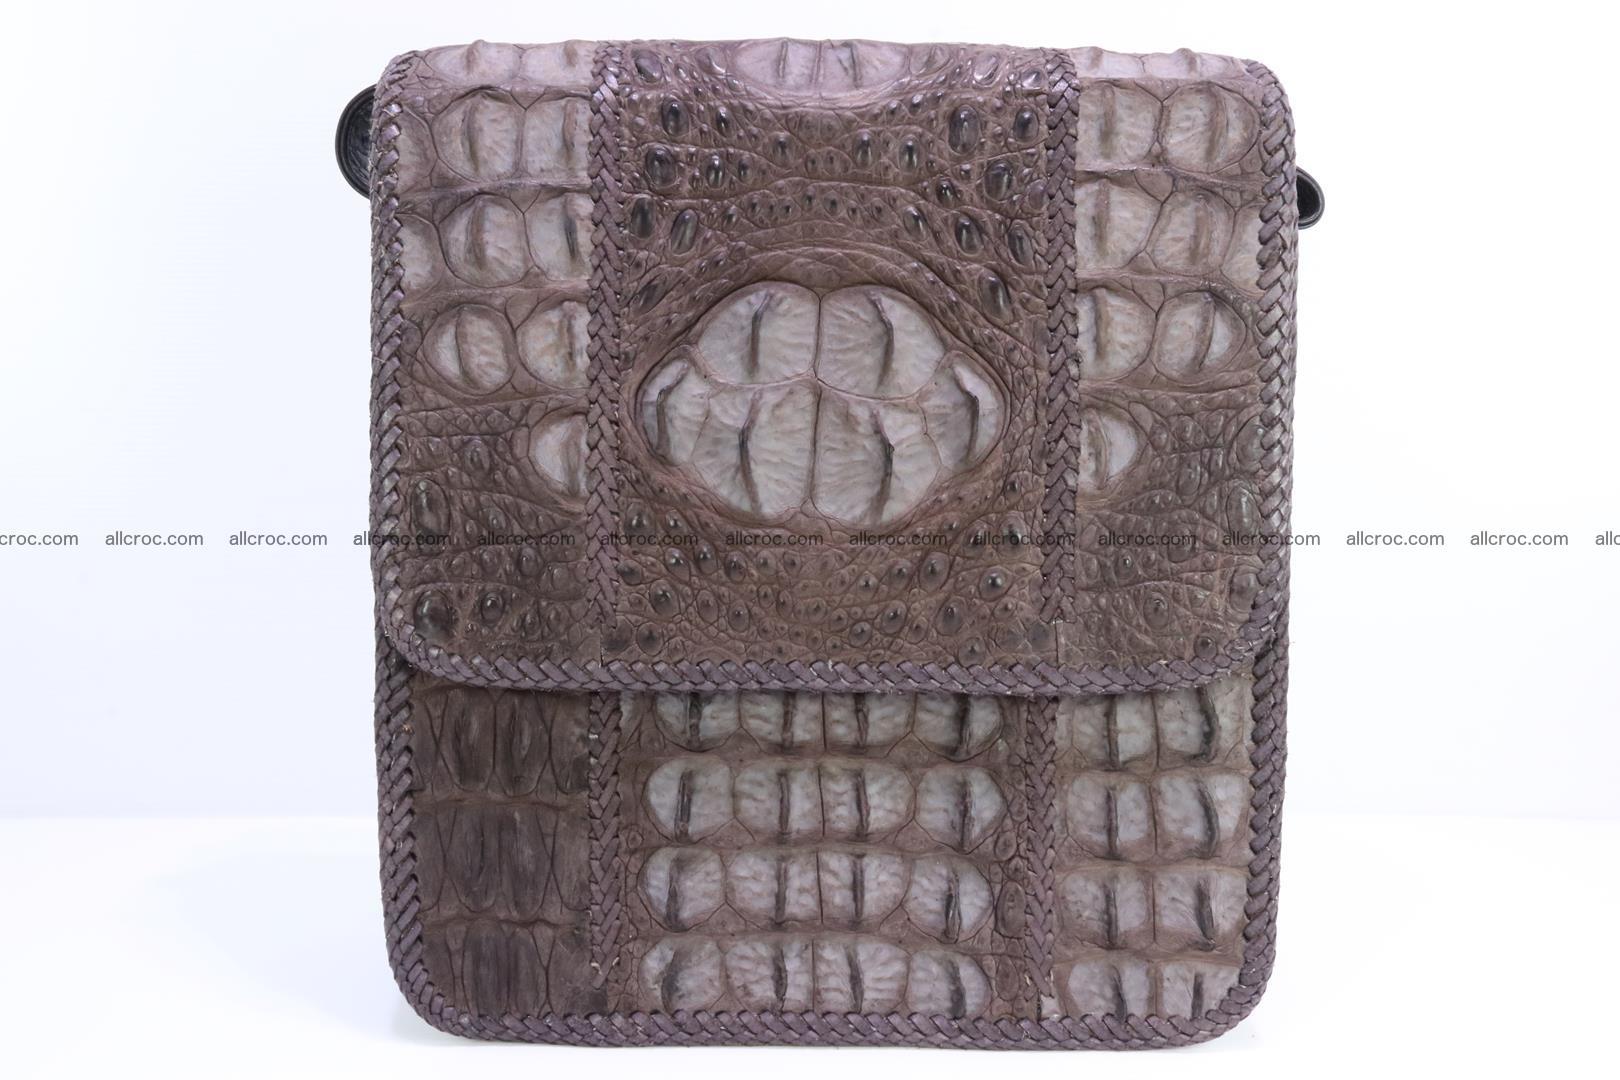 Сrocodile skin shoulder bag with braided edges 142 Foto 0